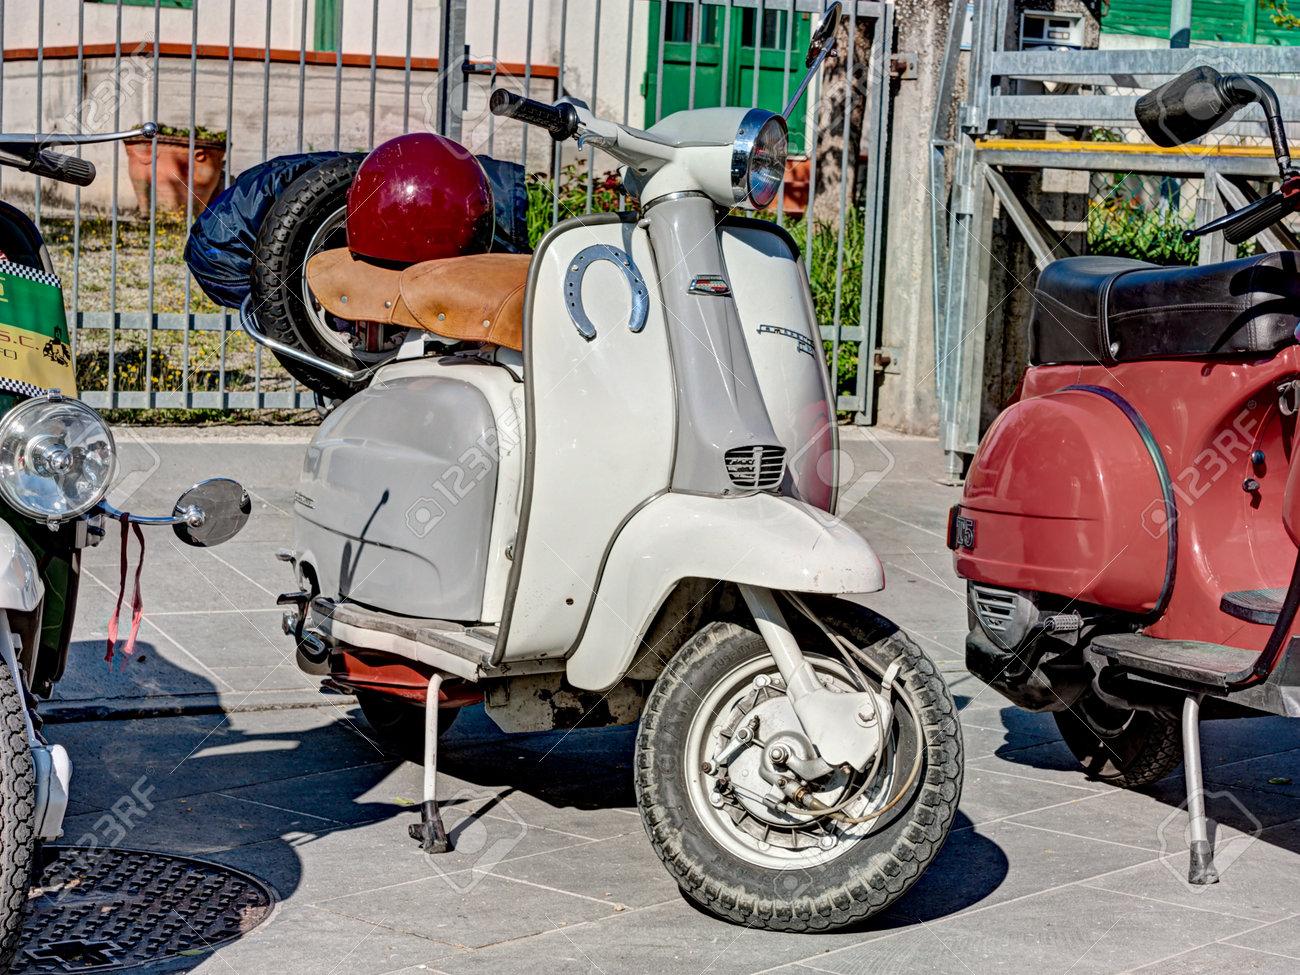 vintage italian scooter Lambretta with a lucky charm horseshoe, at motorcycle rally of Vespa Club Santarcangelo di Romagna, on April 9, 2012 in Poggio Berni (RN) Italy Stock Photo - 18799617